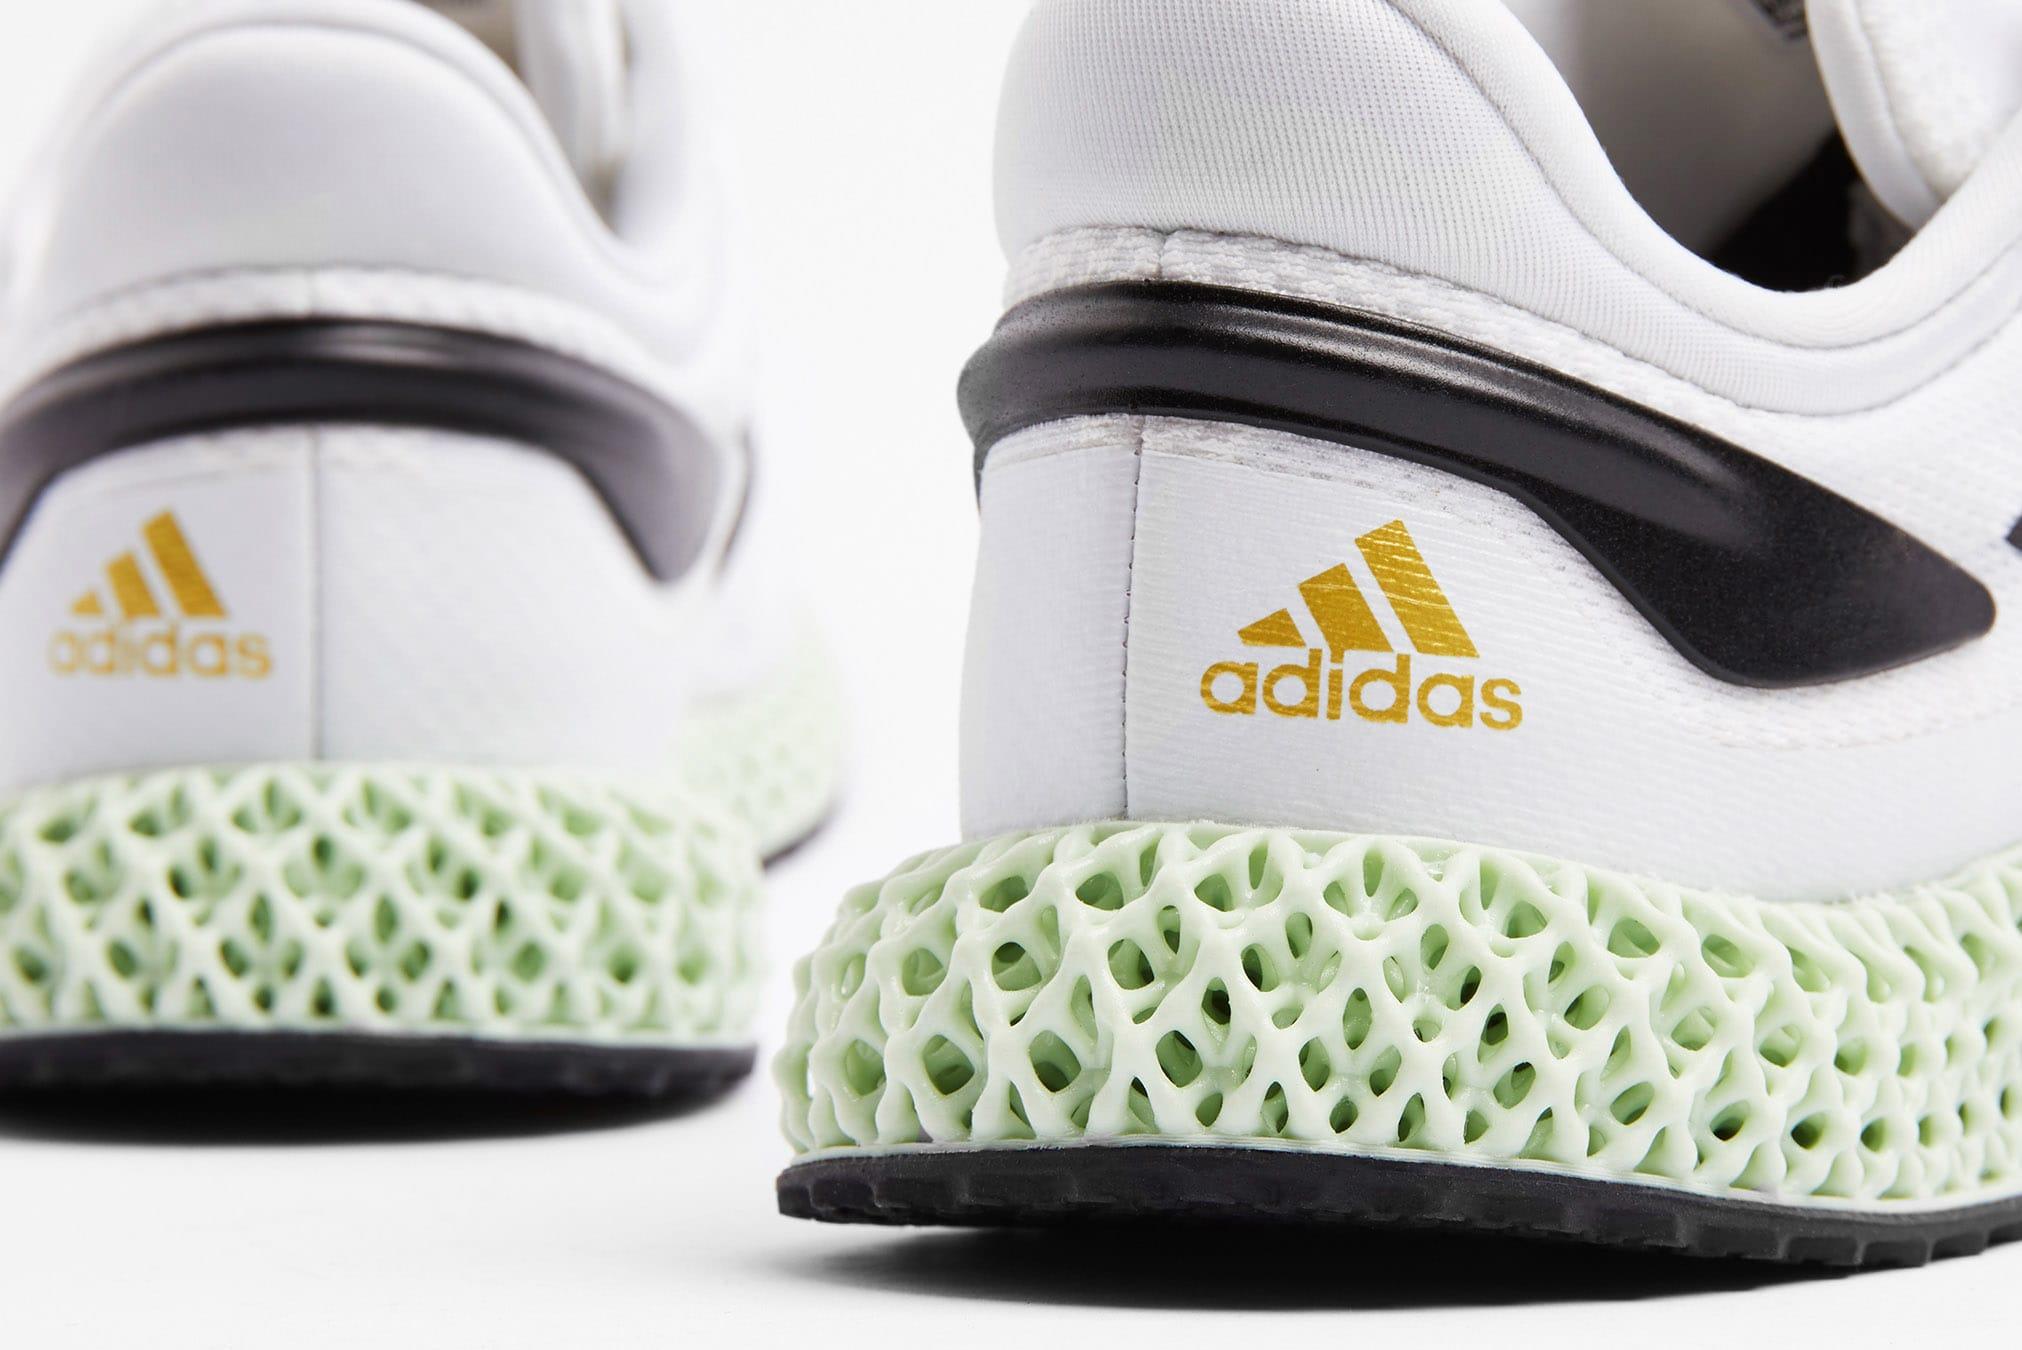 adidas 4D 1.0 - EG6264